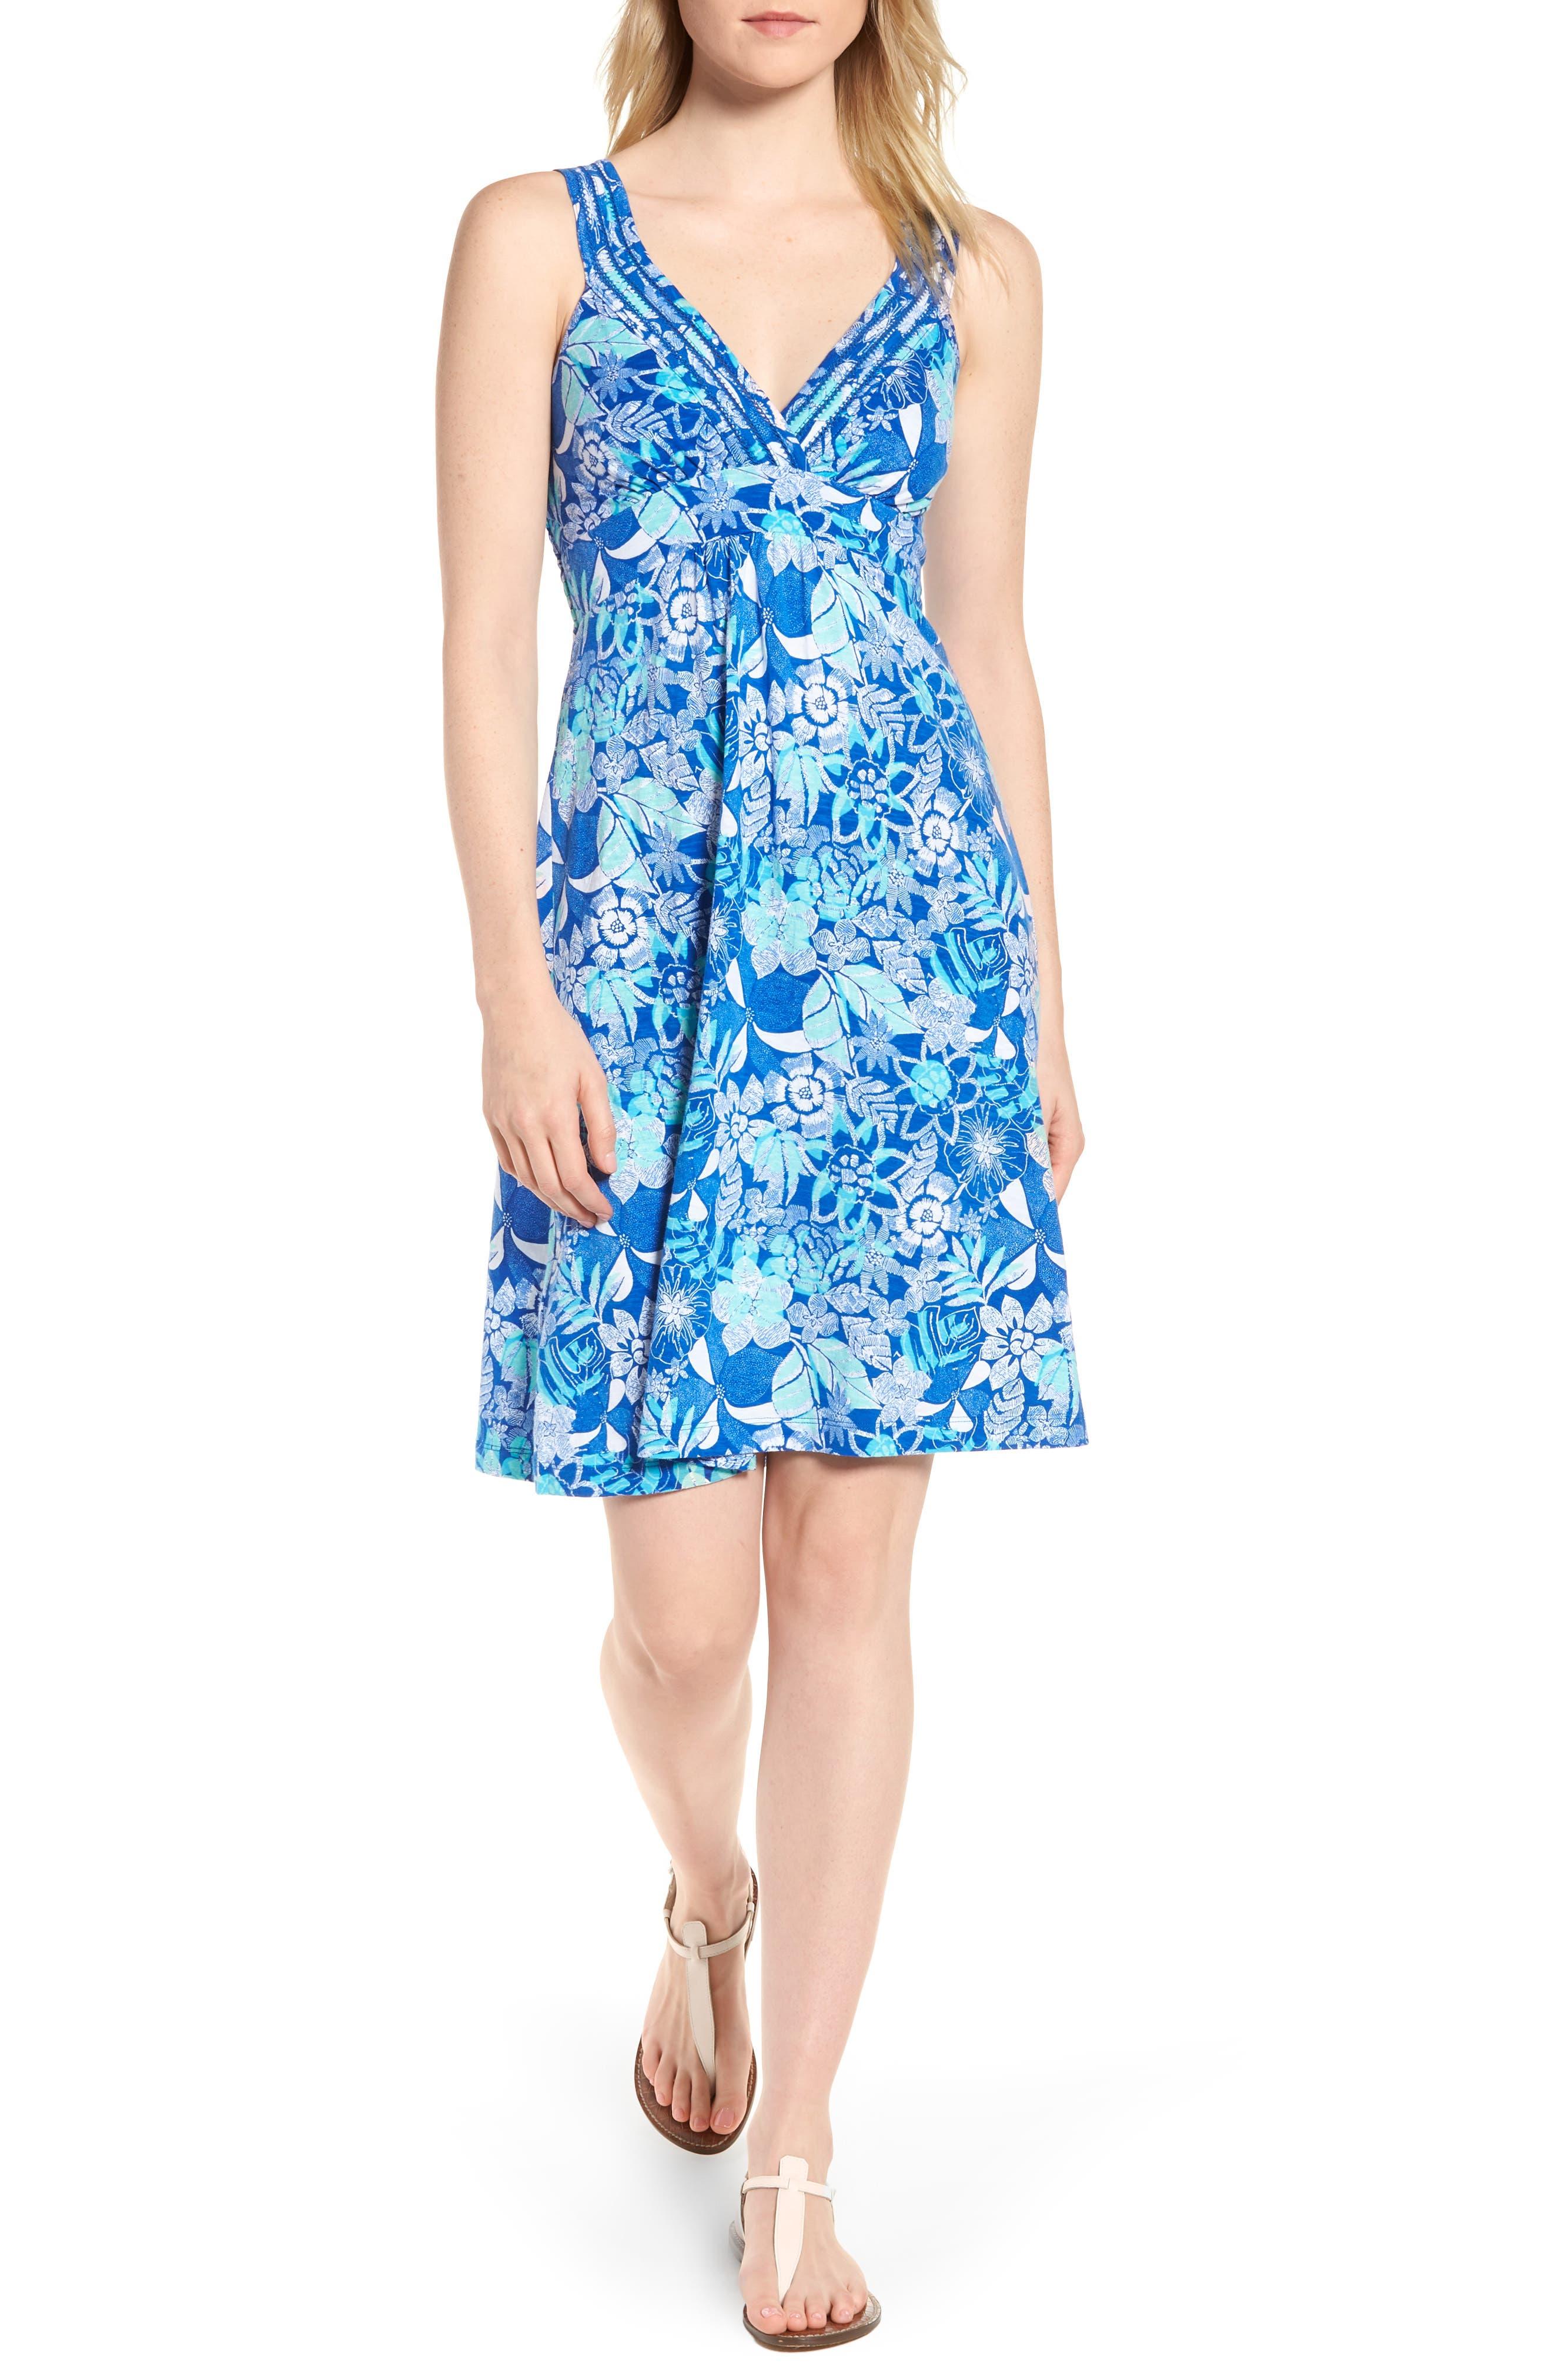 Boardwalk Blooms A-Line Dress,                         Main,                         color, Cobalt